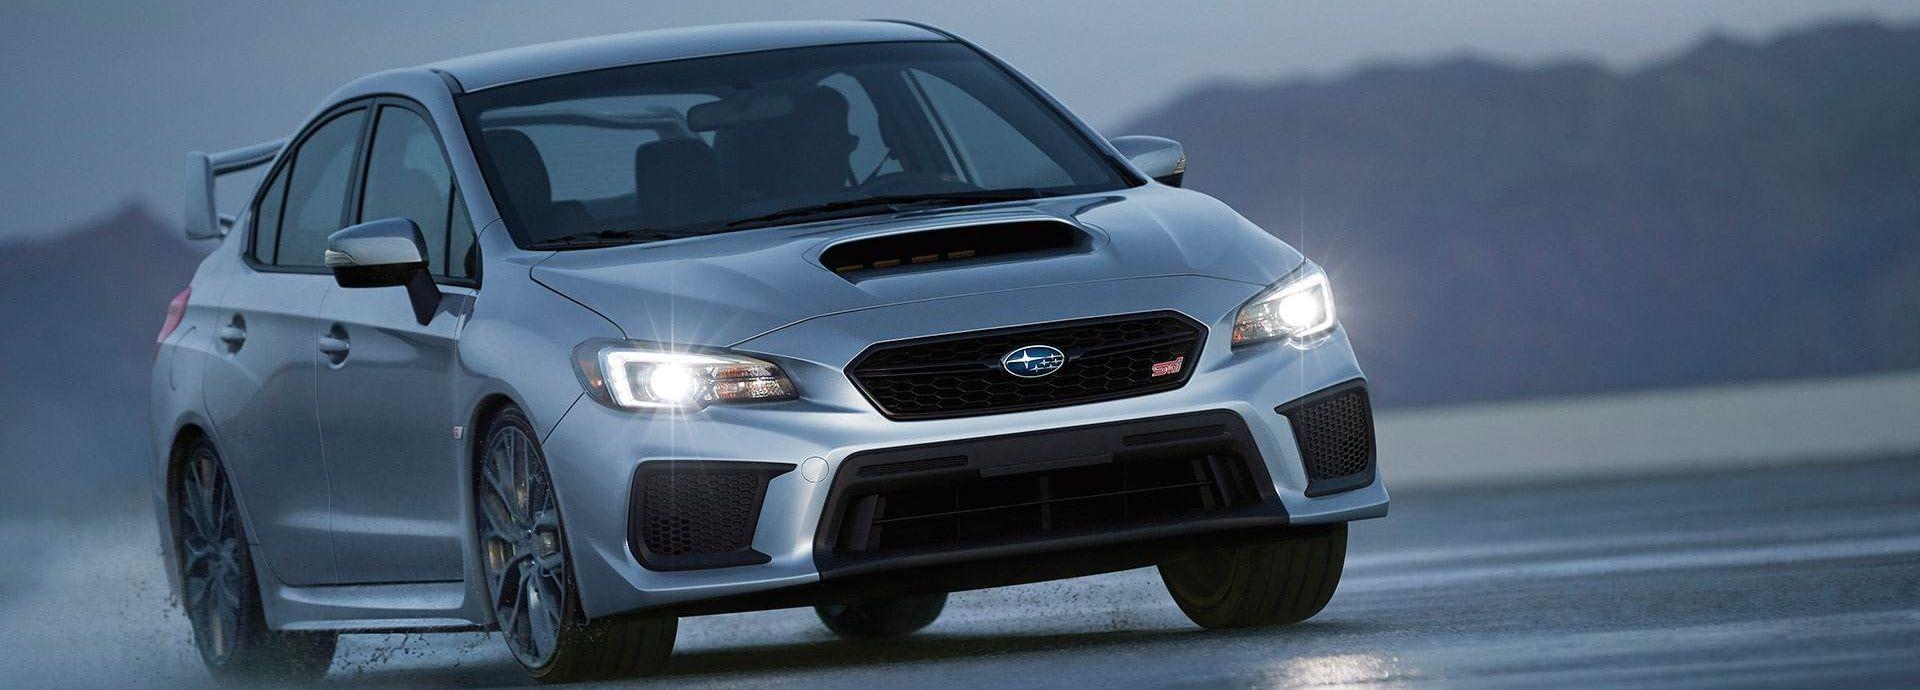 2018 Subaru WRX For Sale In Catskill NY